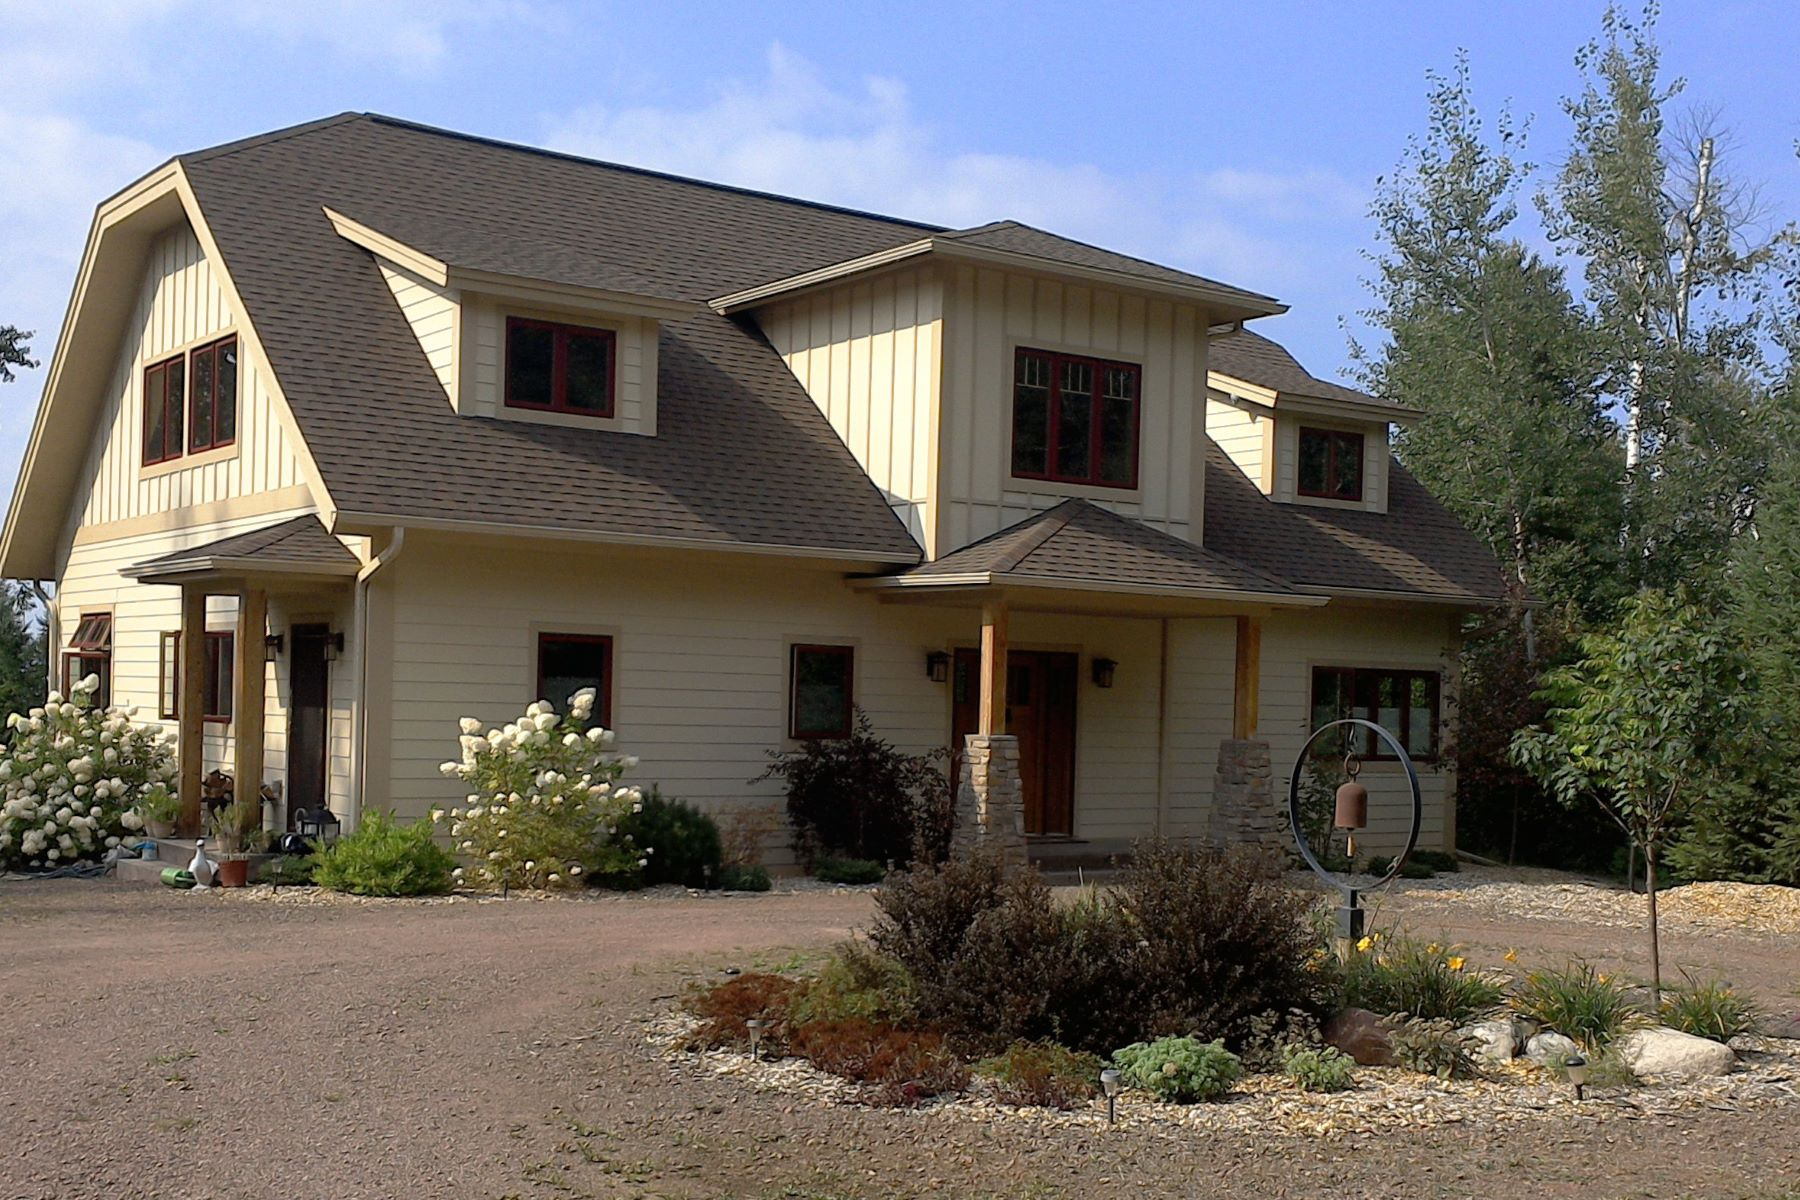 sales property at 2788 North Shore Road, Madeline Island, La Pointe